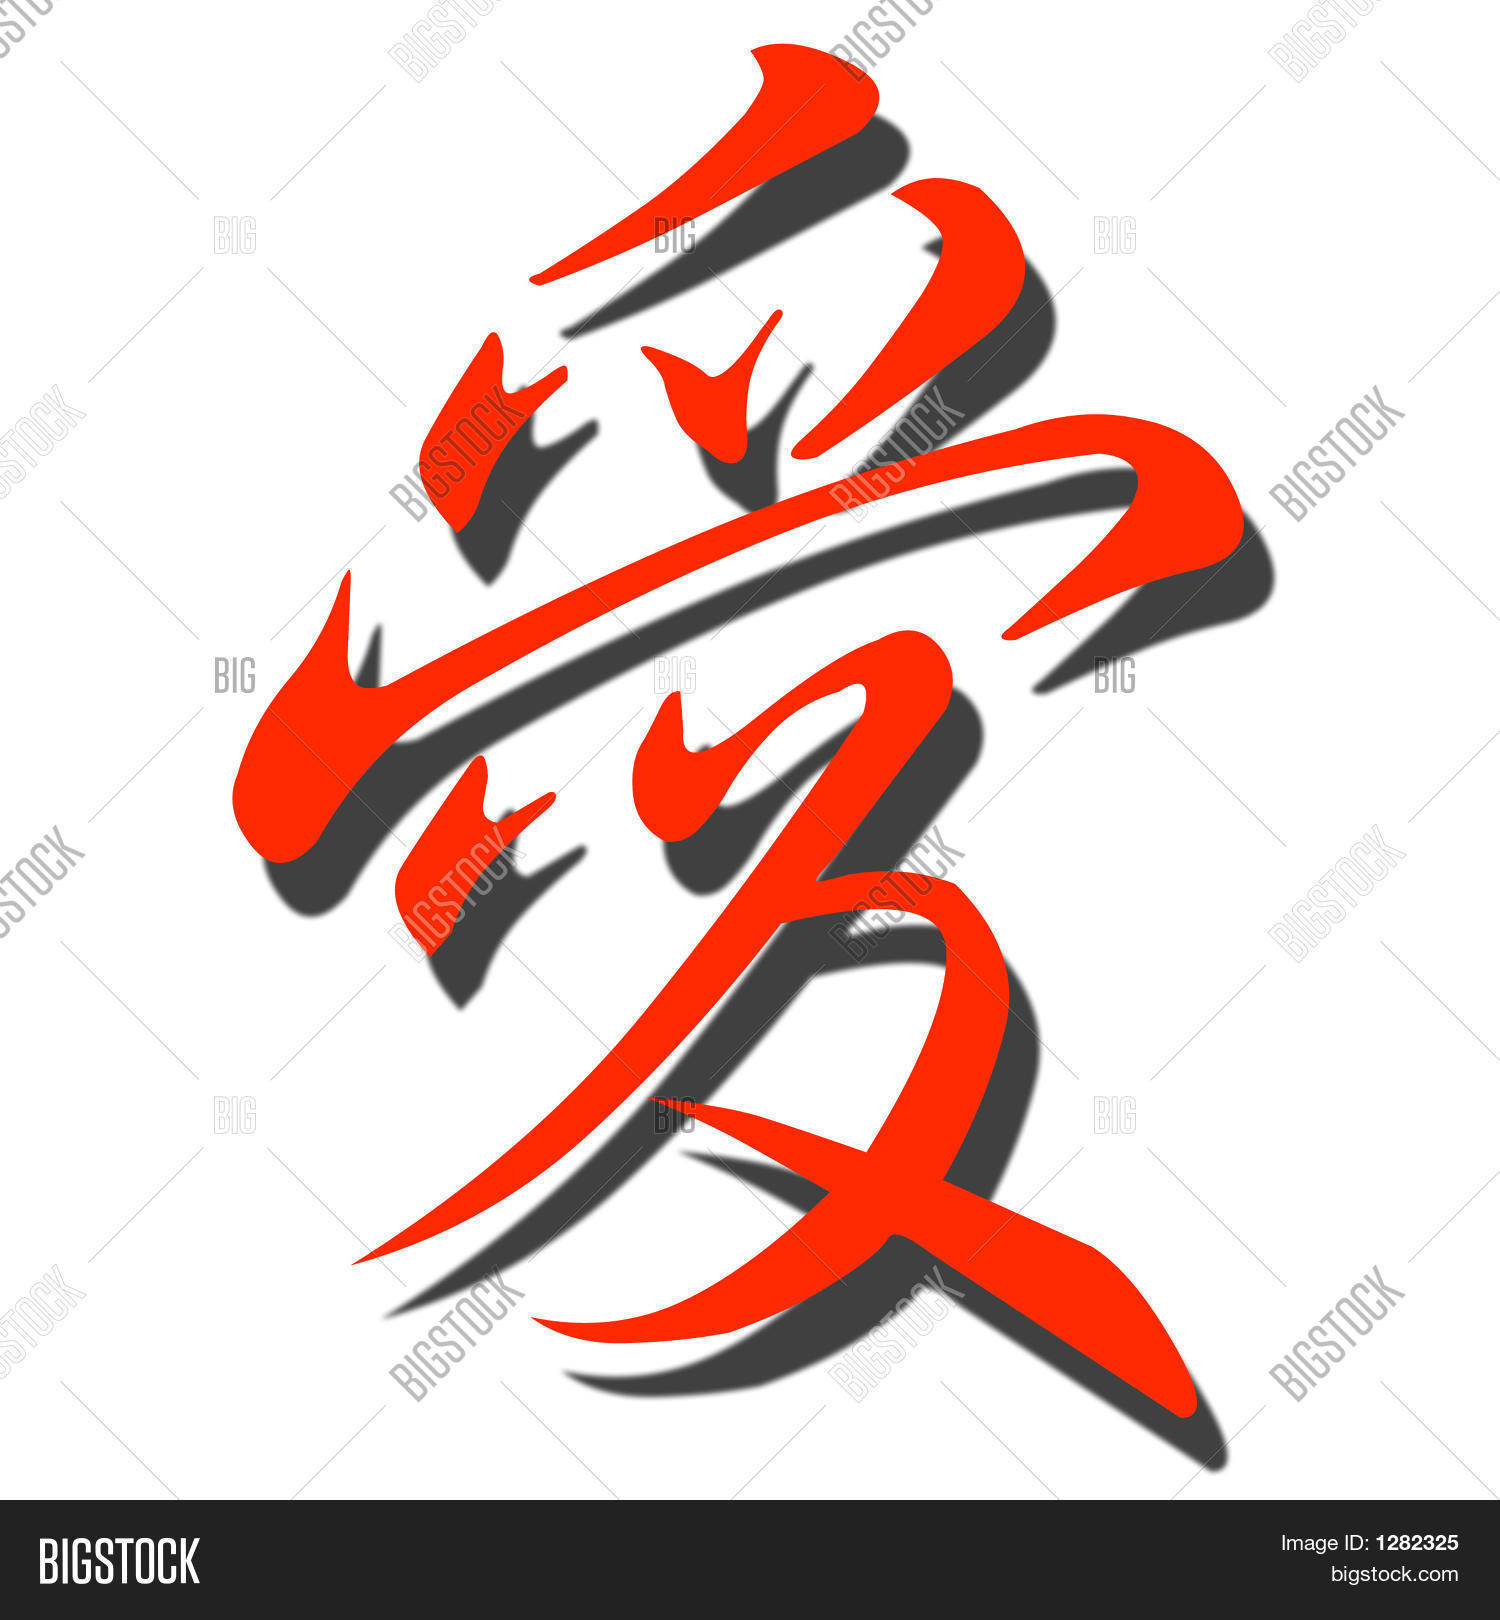 Chinese Symbol Love Image Photo Bigstock